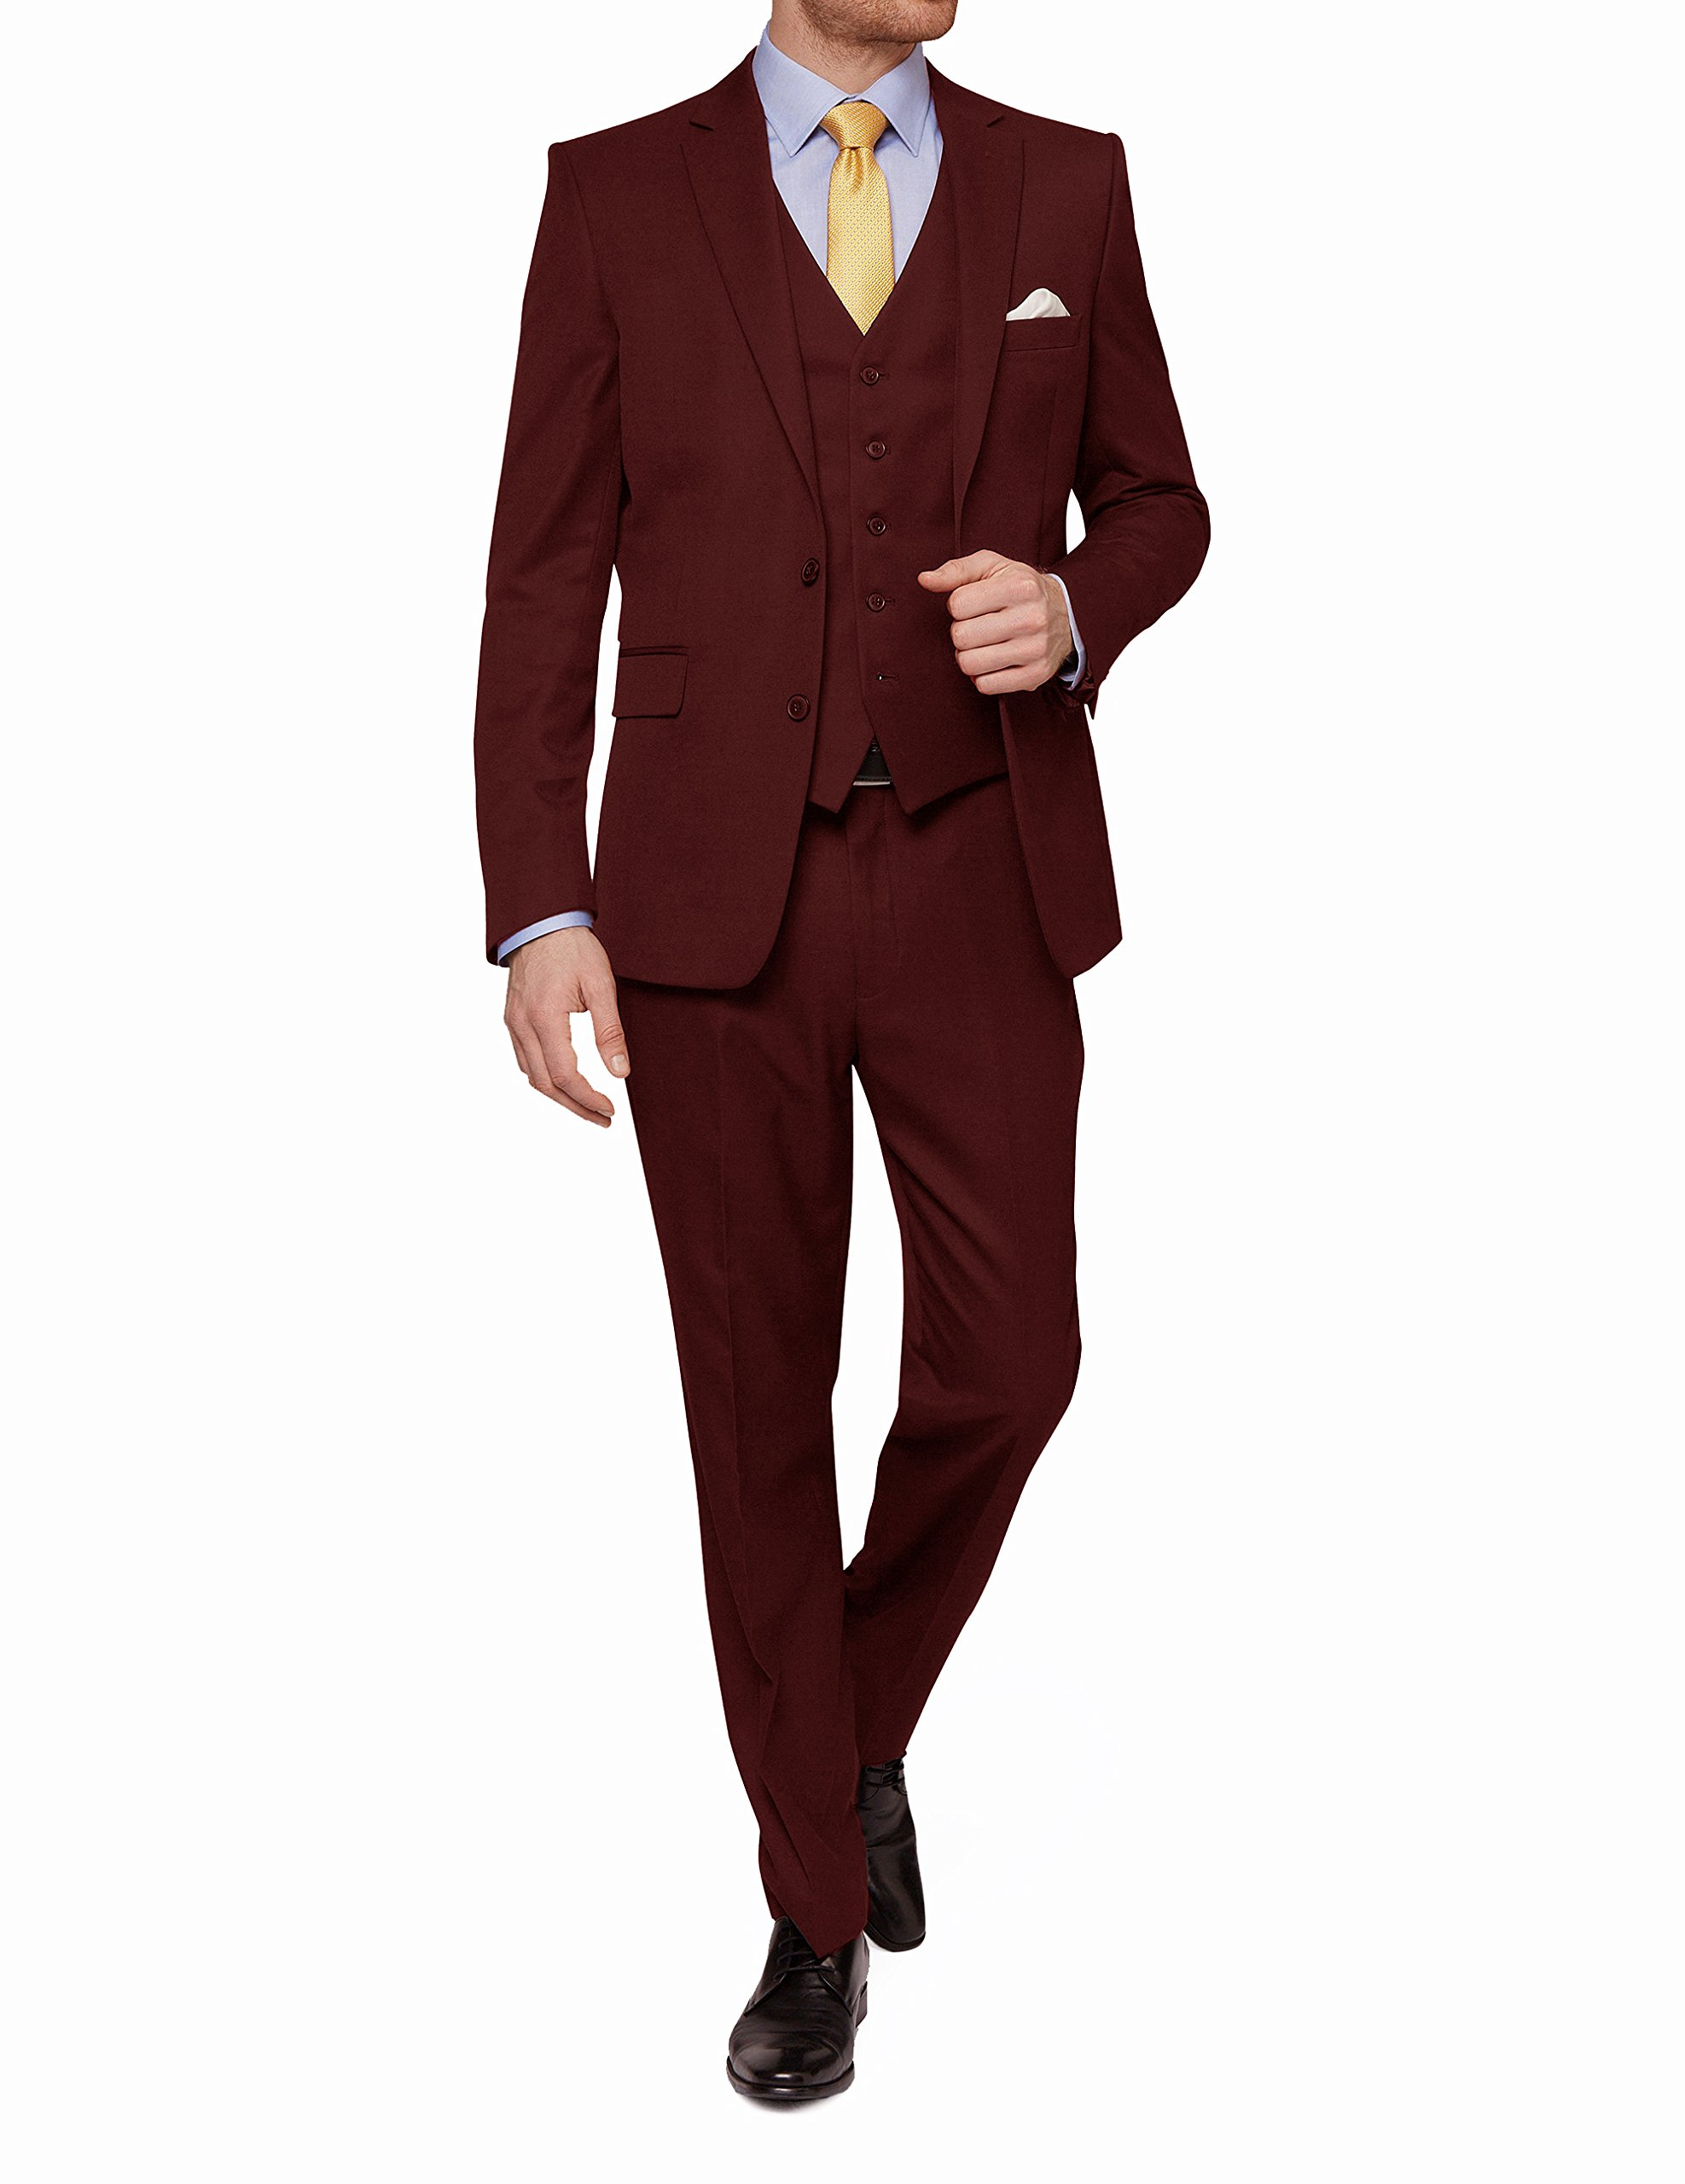 MDRN Uomo Mens Slim Fit 3 Piece Suit, Burgundy, Size 44Sx38W